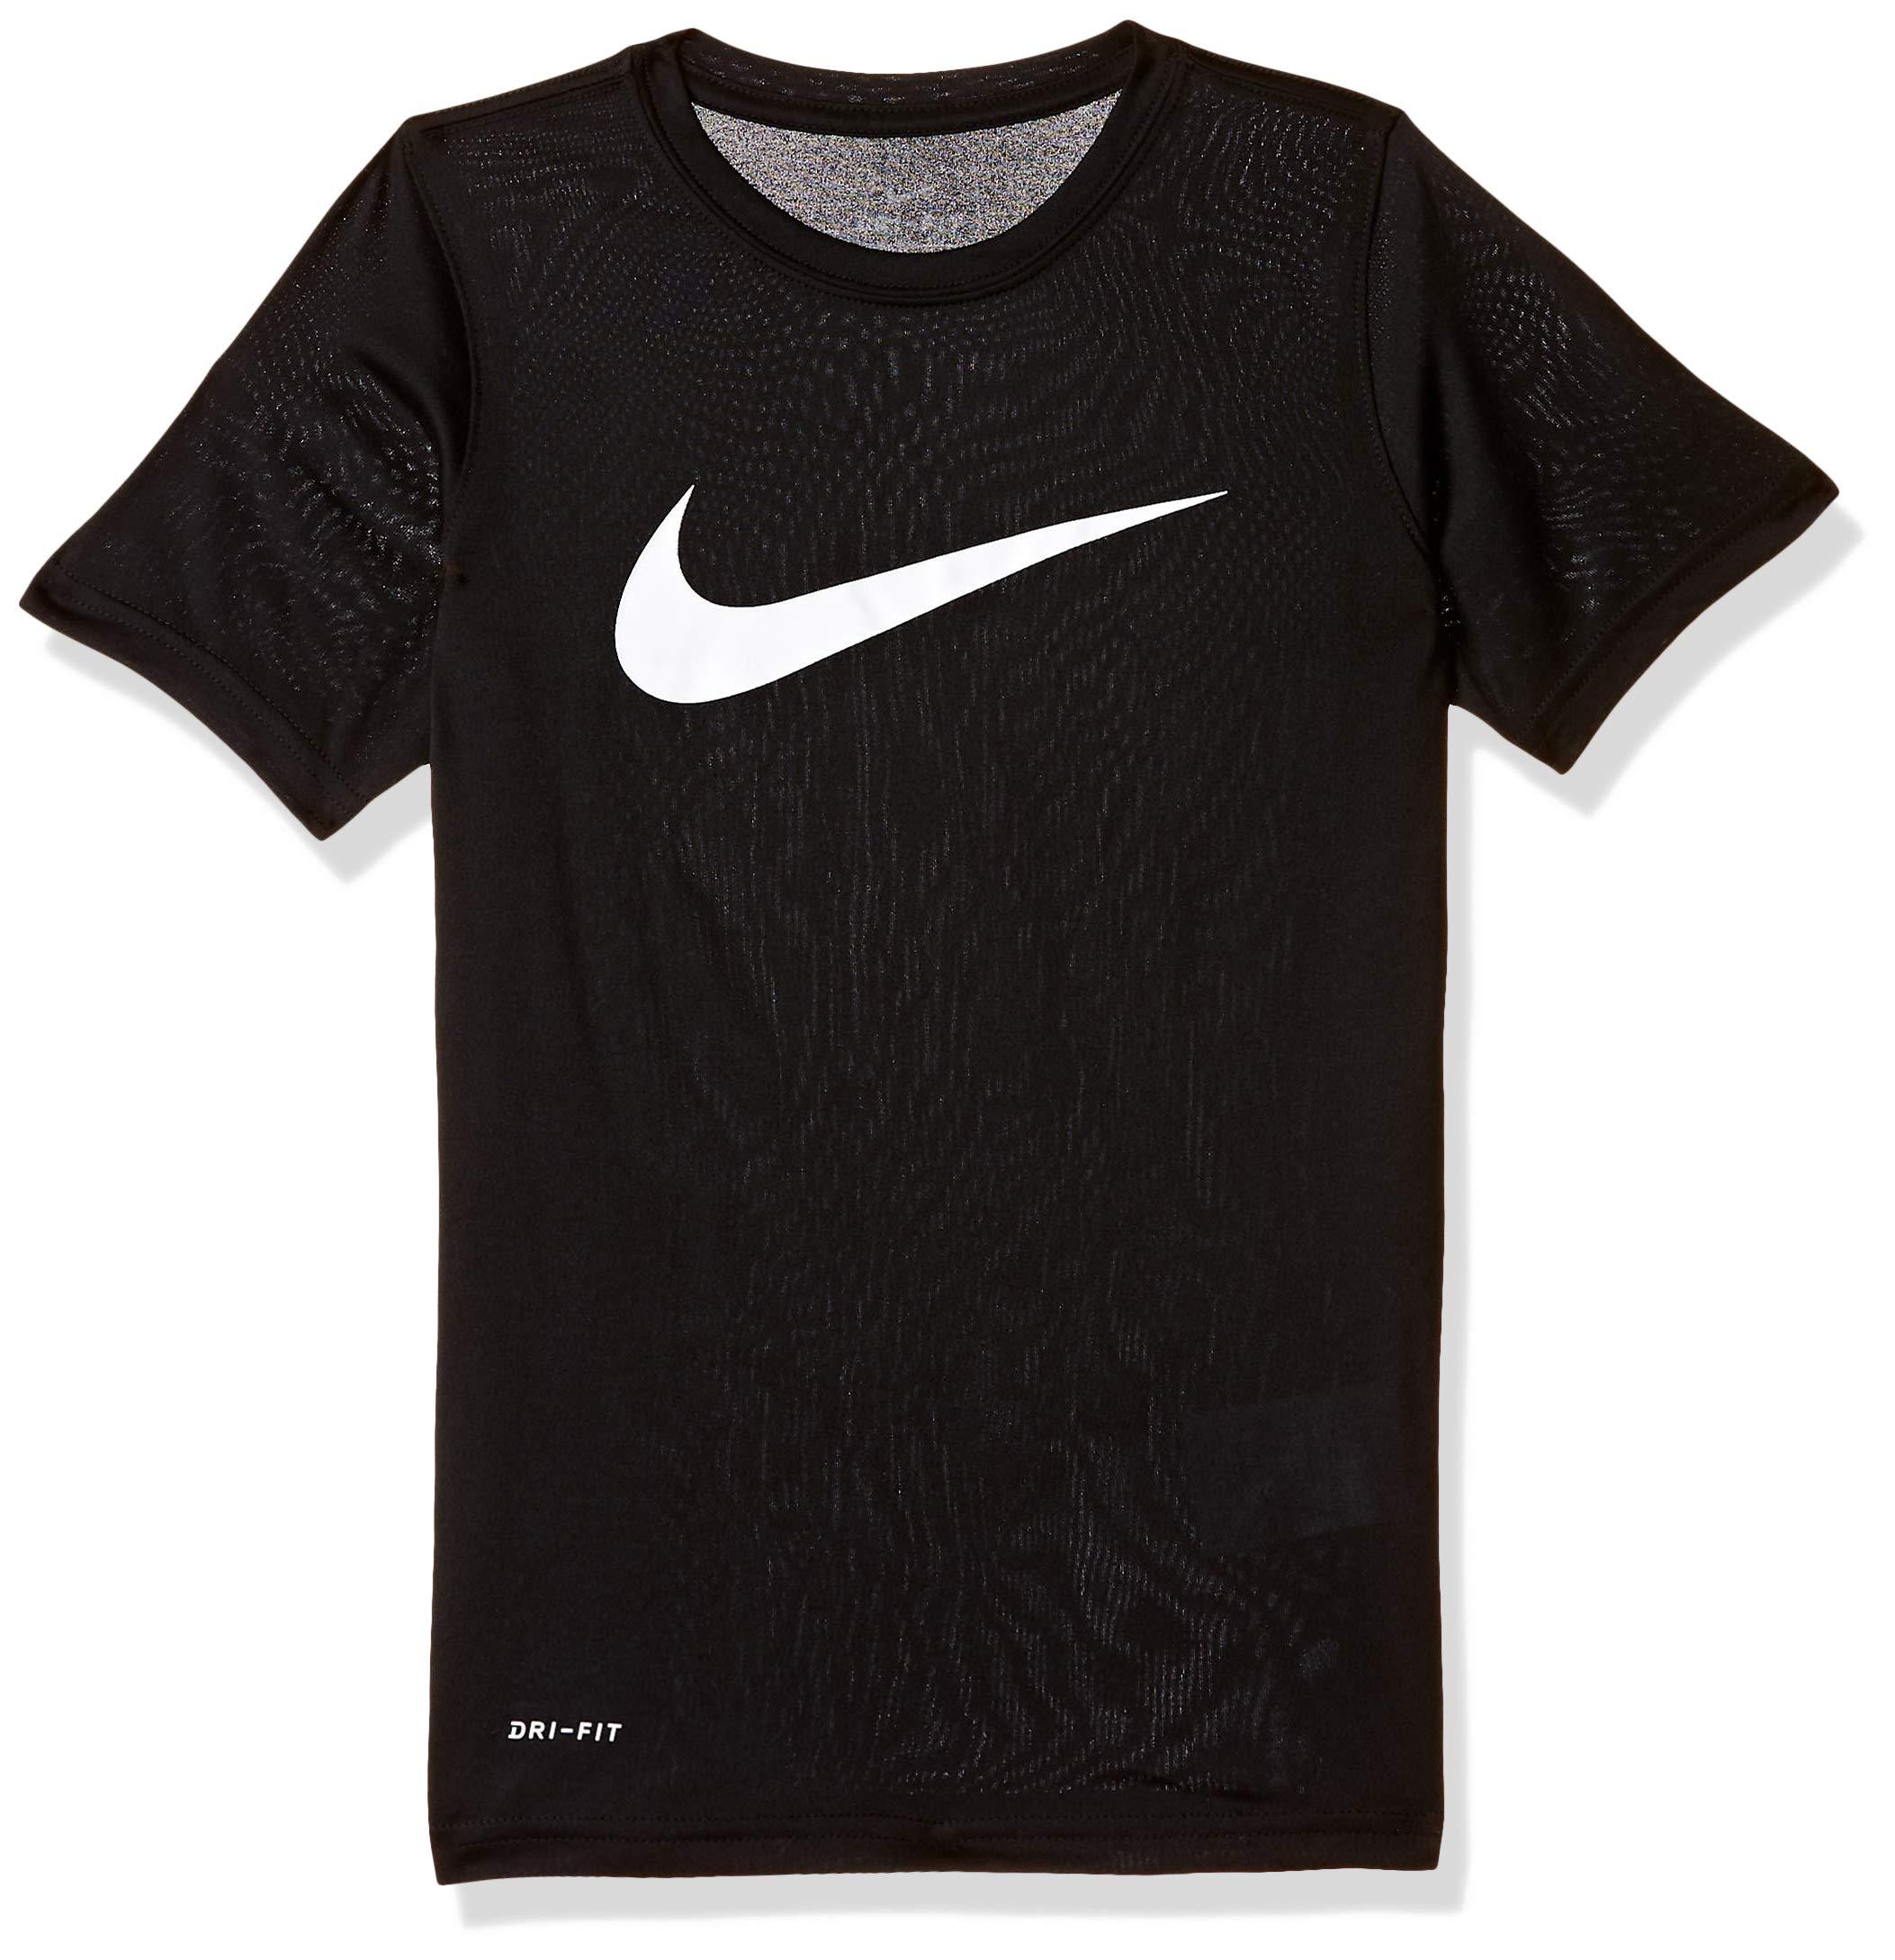 NIKE Boys' Dry Short Sleeve Swoosh Solid Tee, Black/White, X-Small